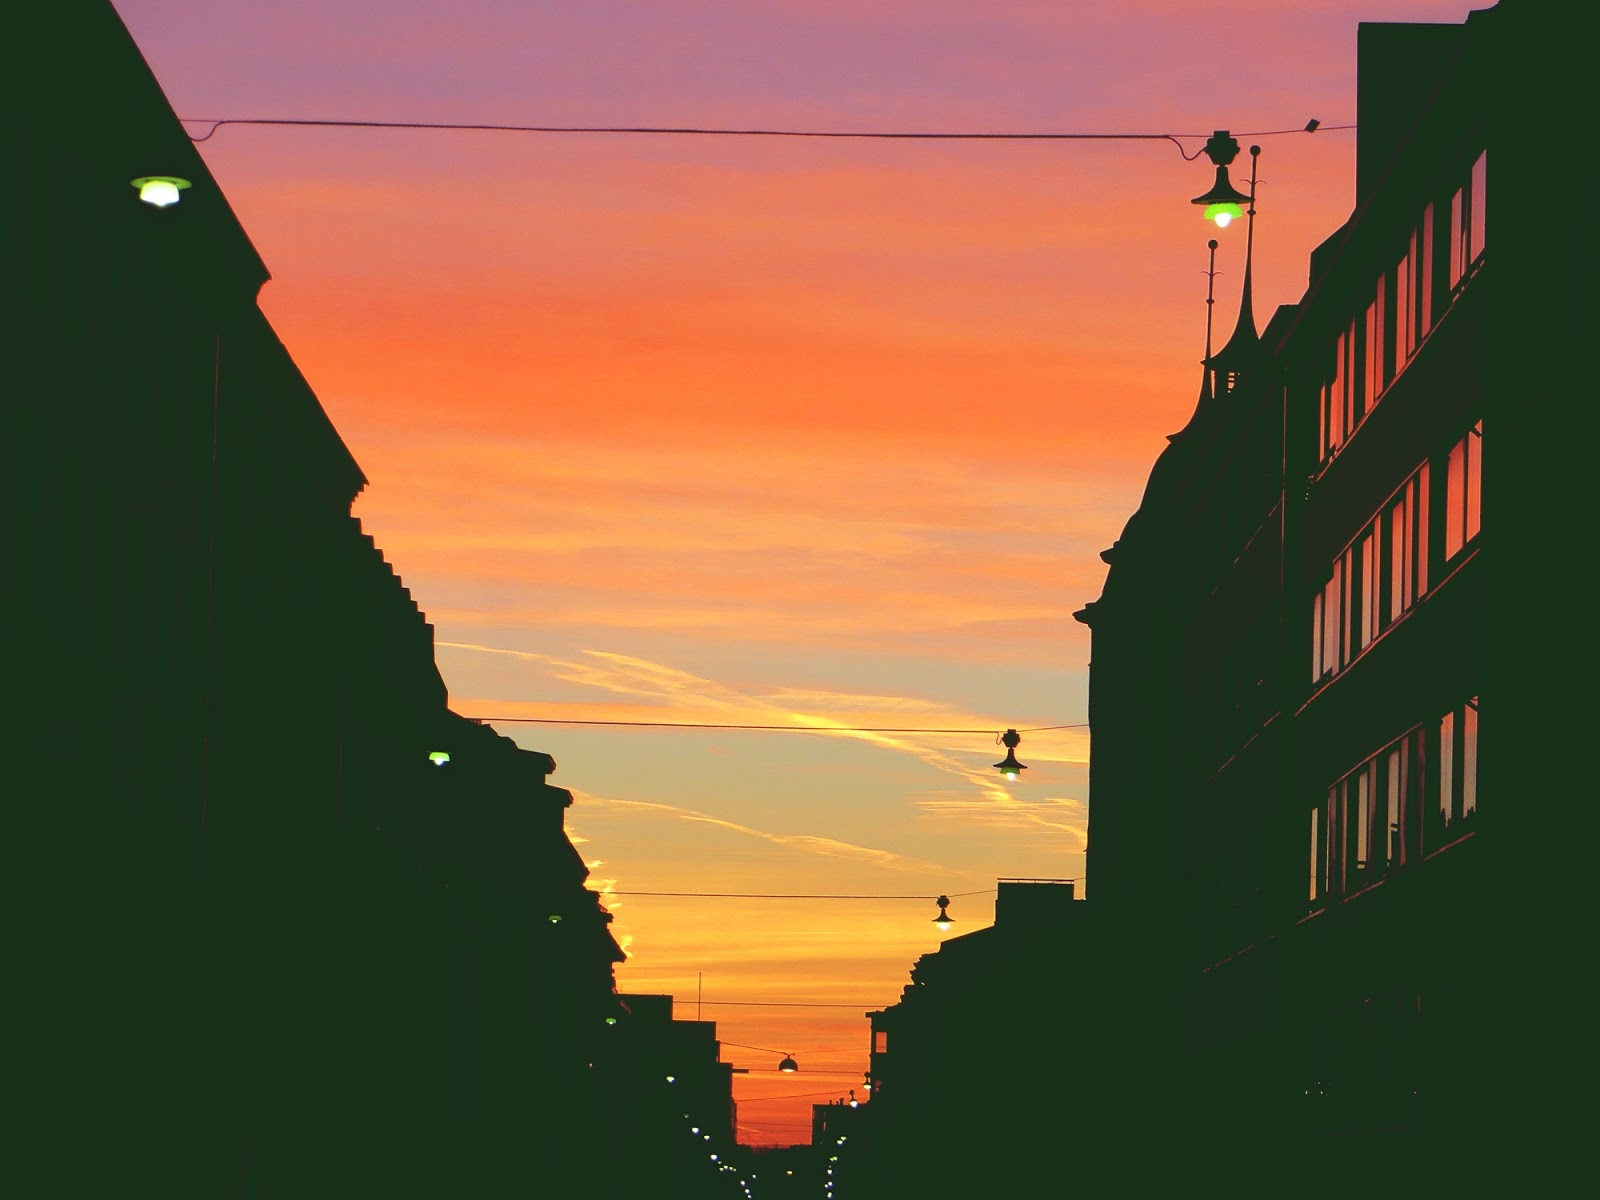 Auringonlasku, sunset, Helsinki, amazing view, upeimmat auringonlaskut